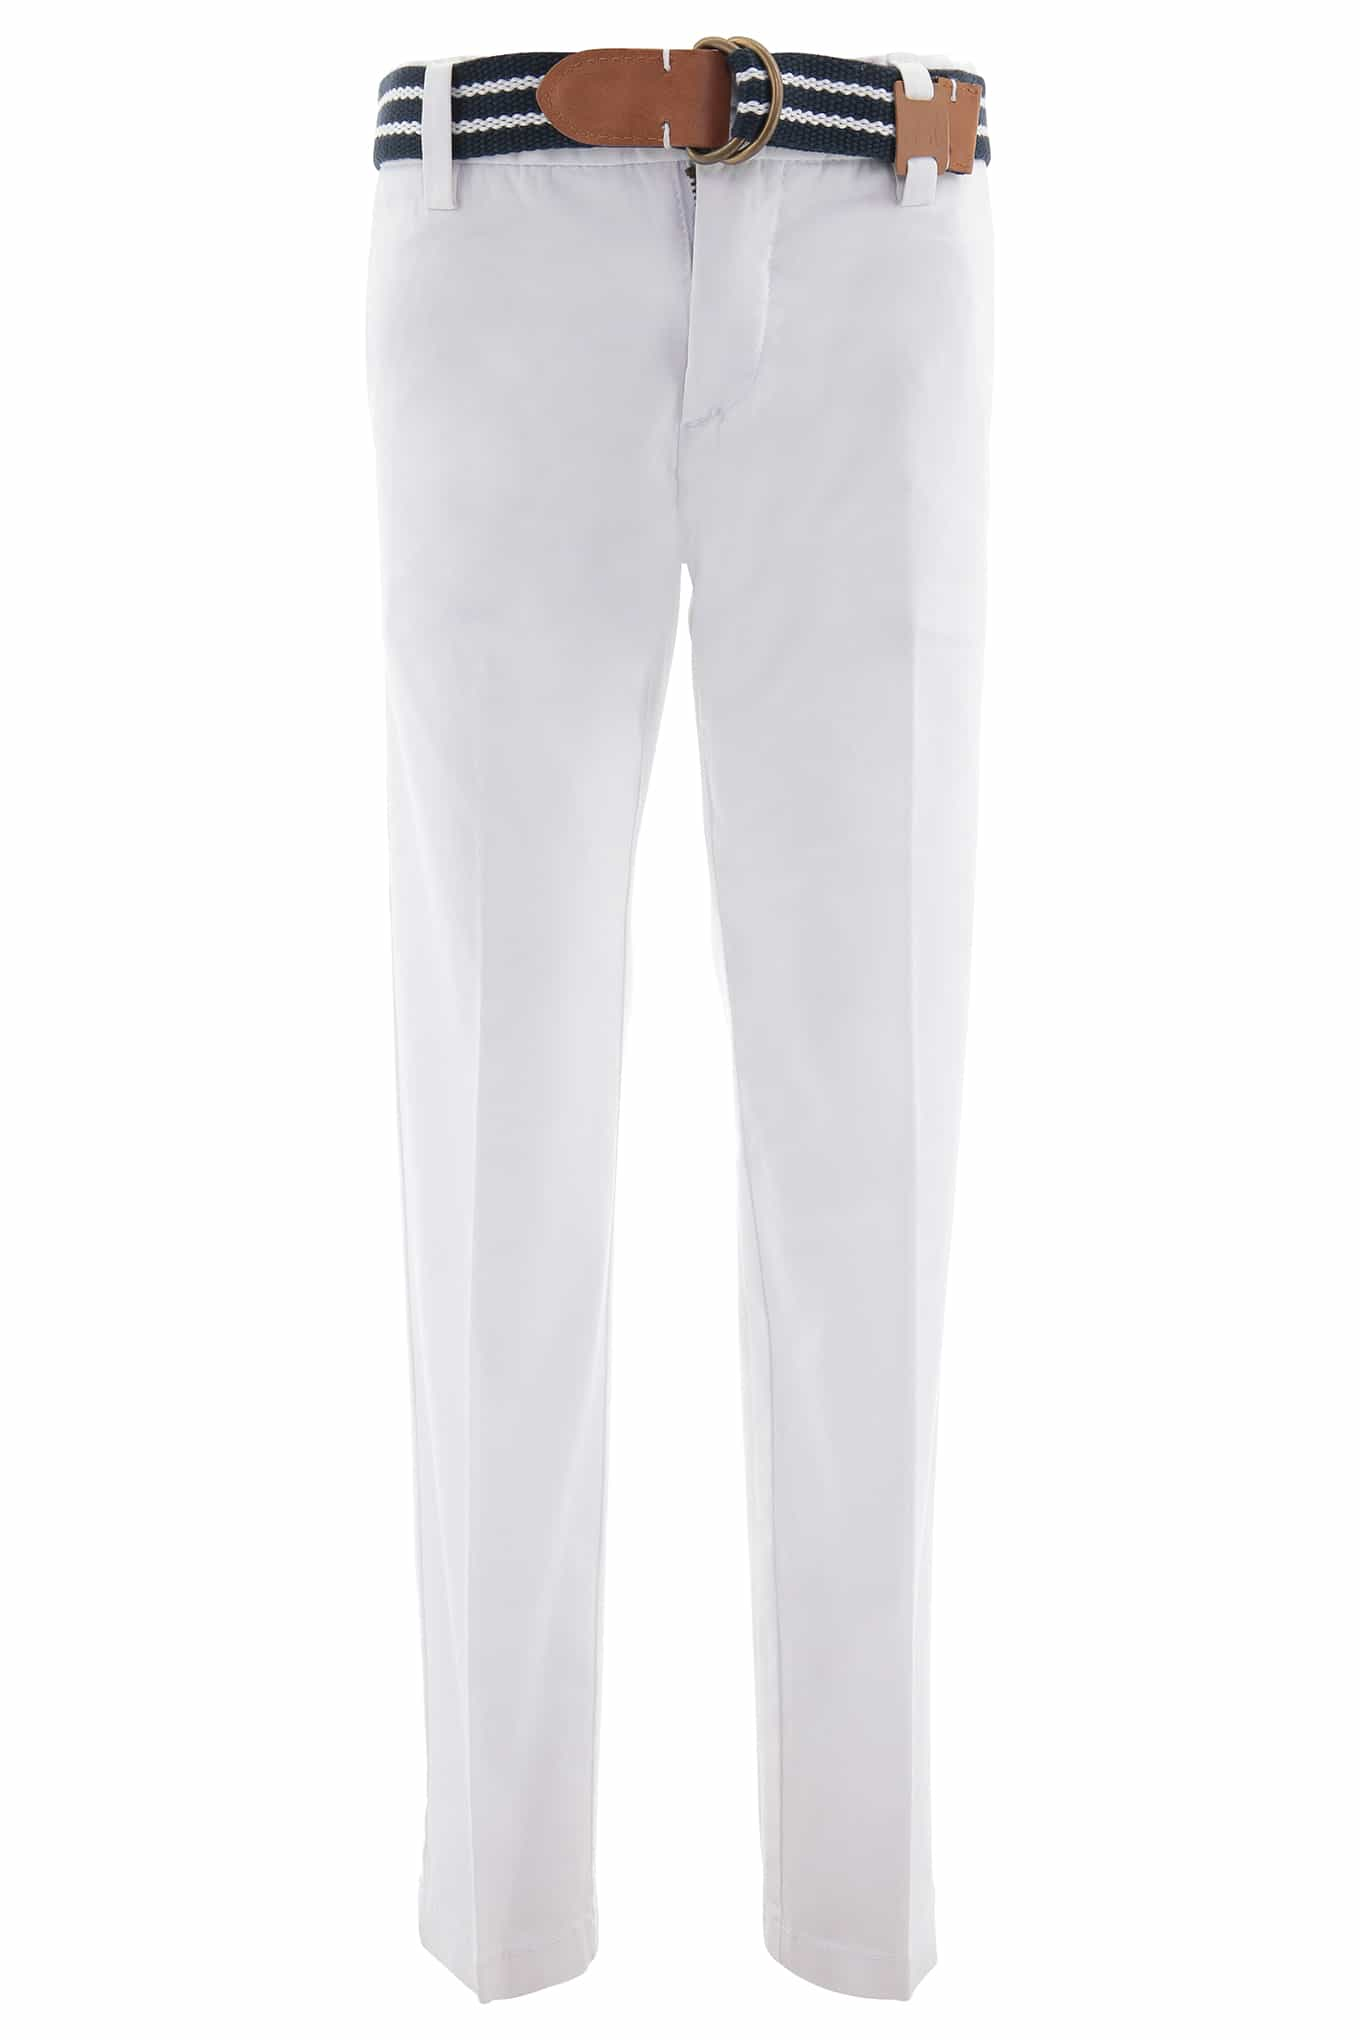 Chino Trousers White Sport Boy